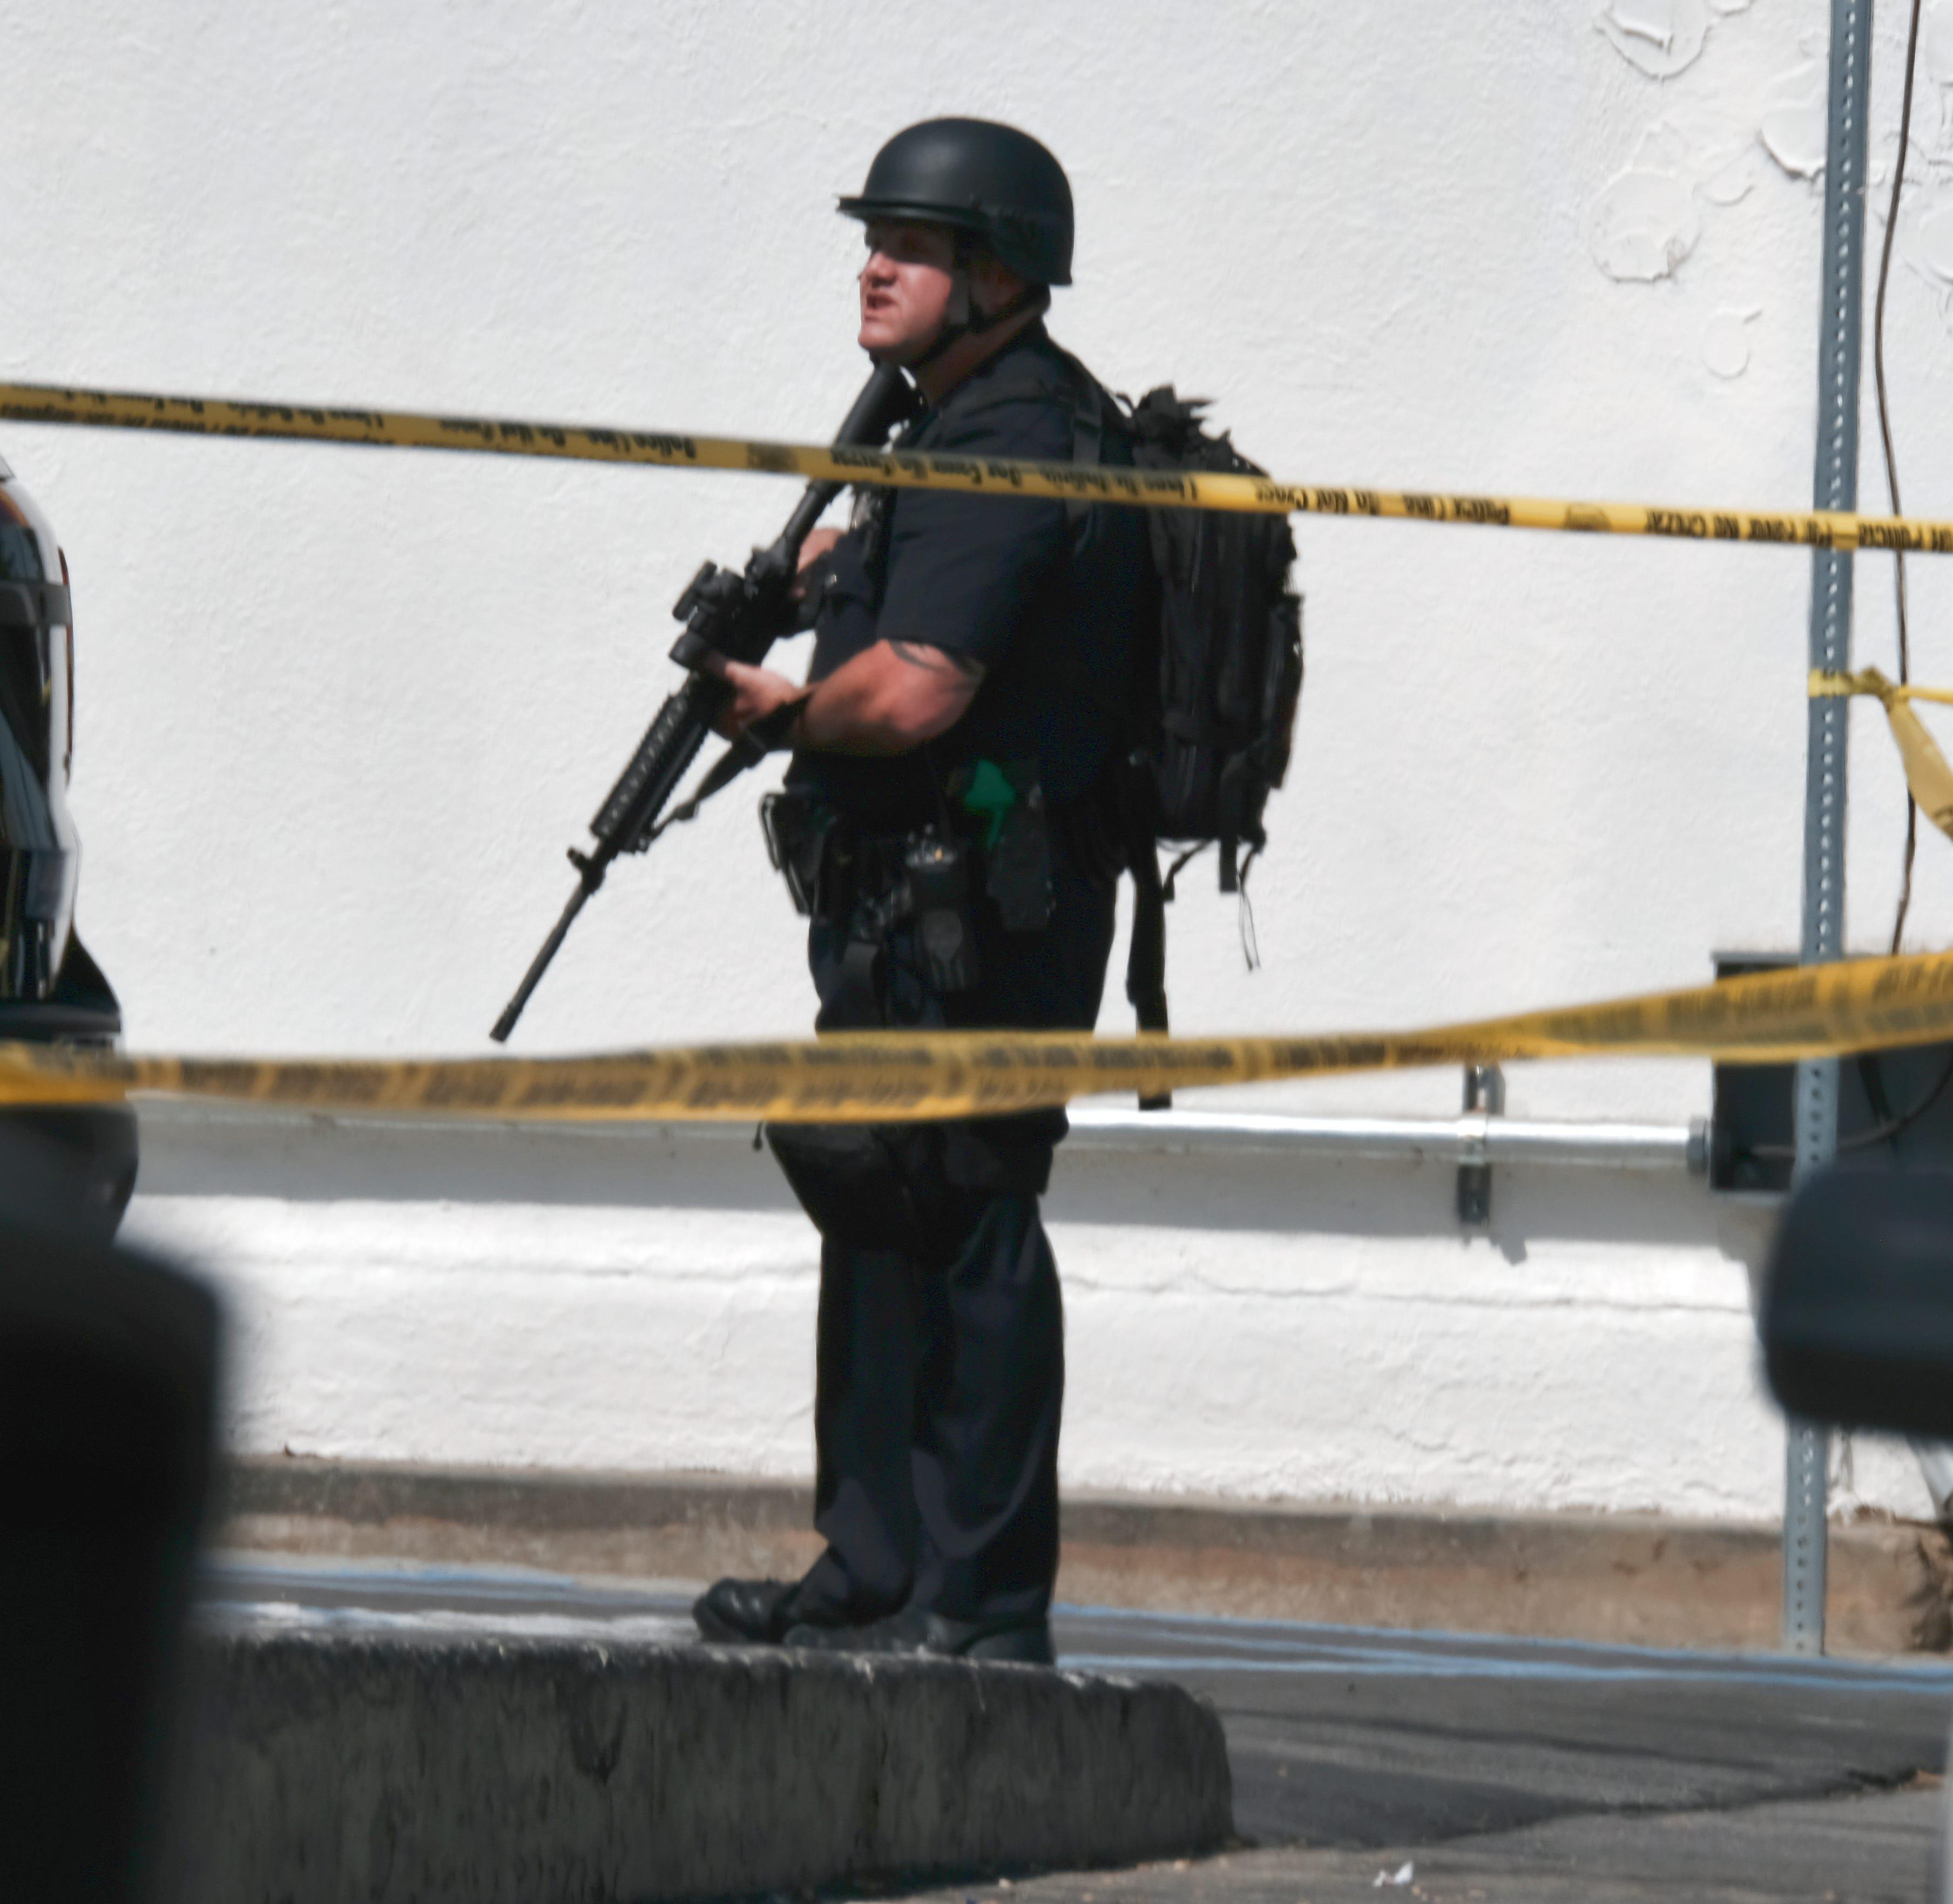 Shooting hurts 2 near Van Nuys charter school